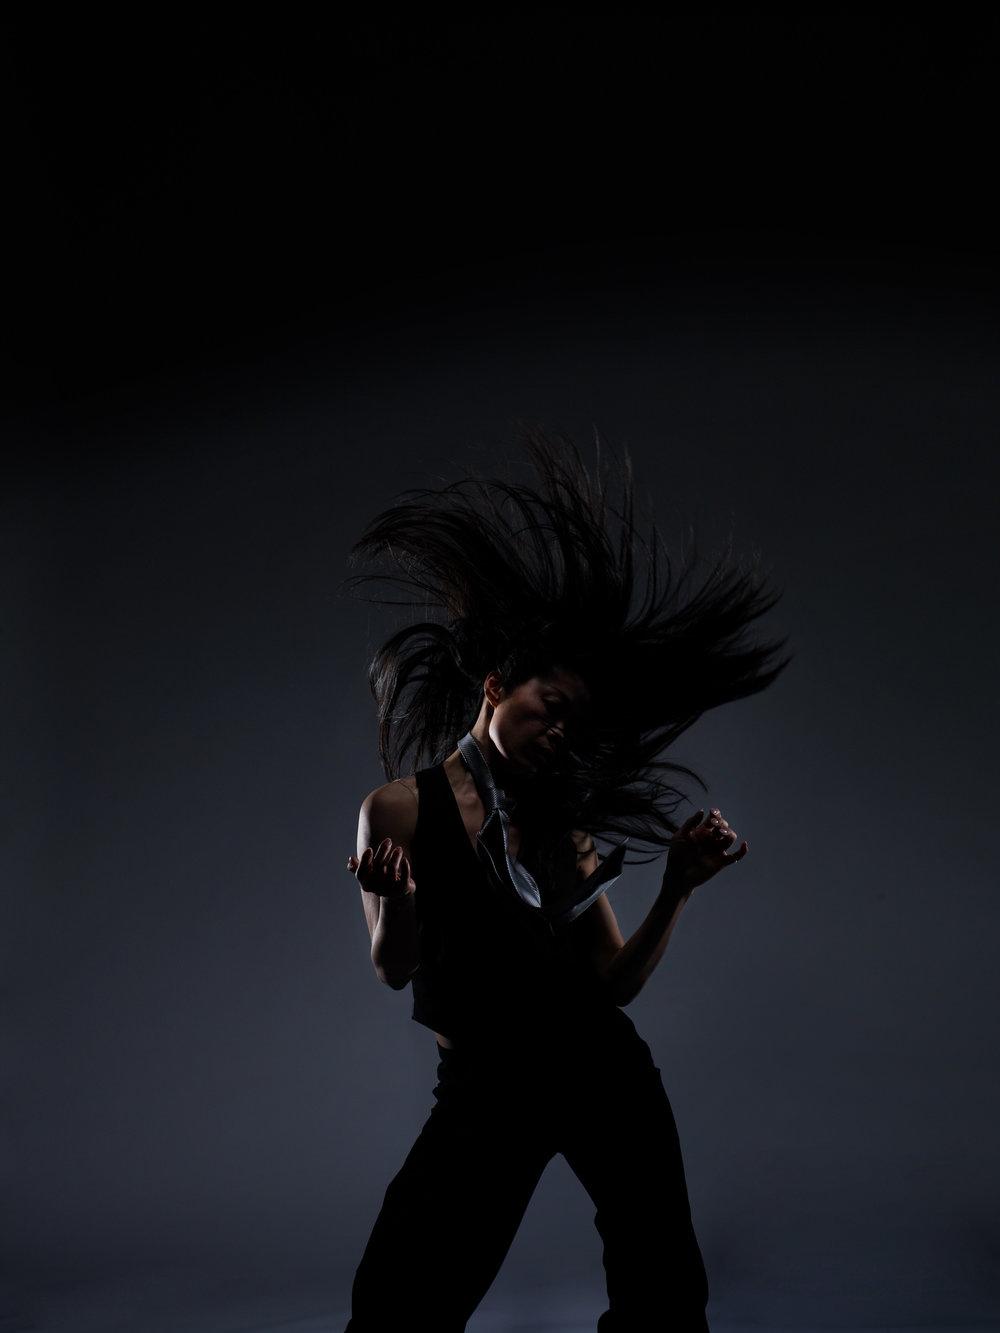 Bern_Ballet08_2-006546.jpg